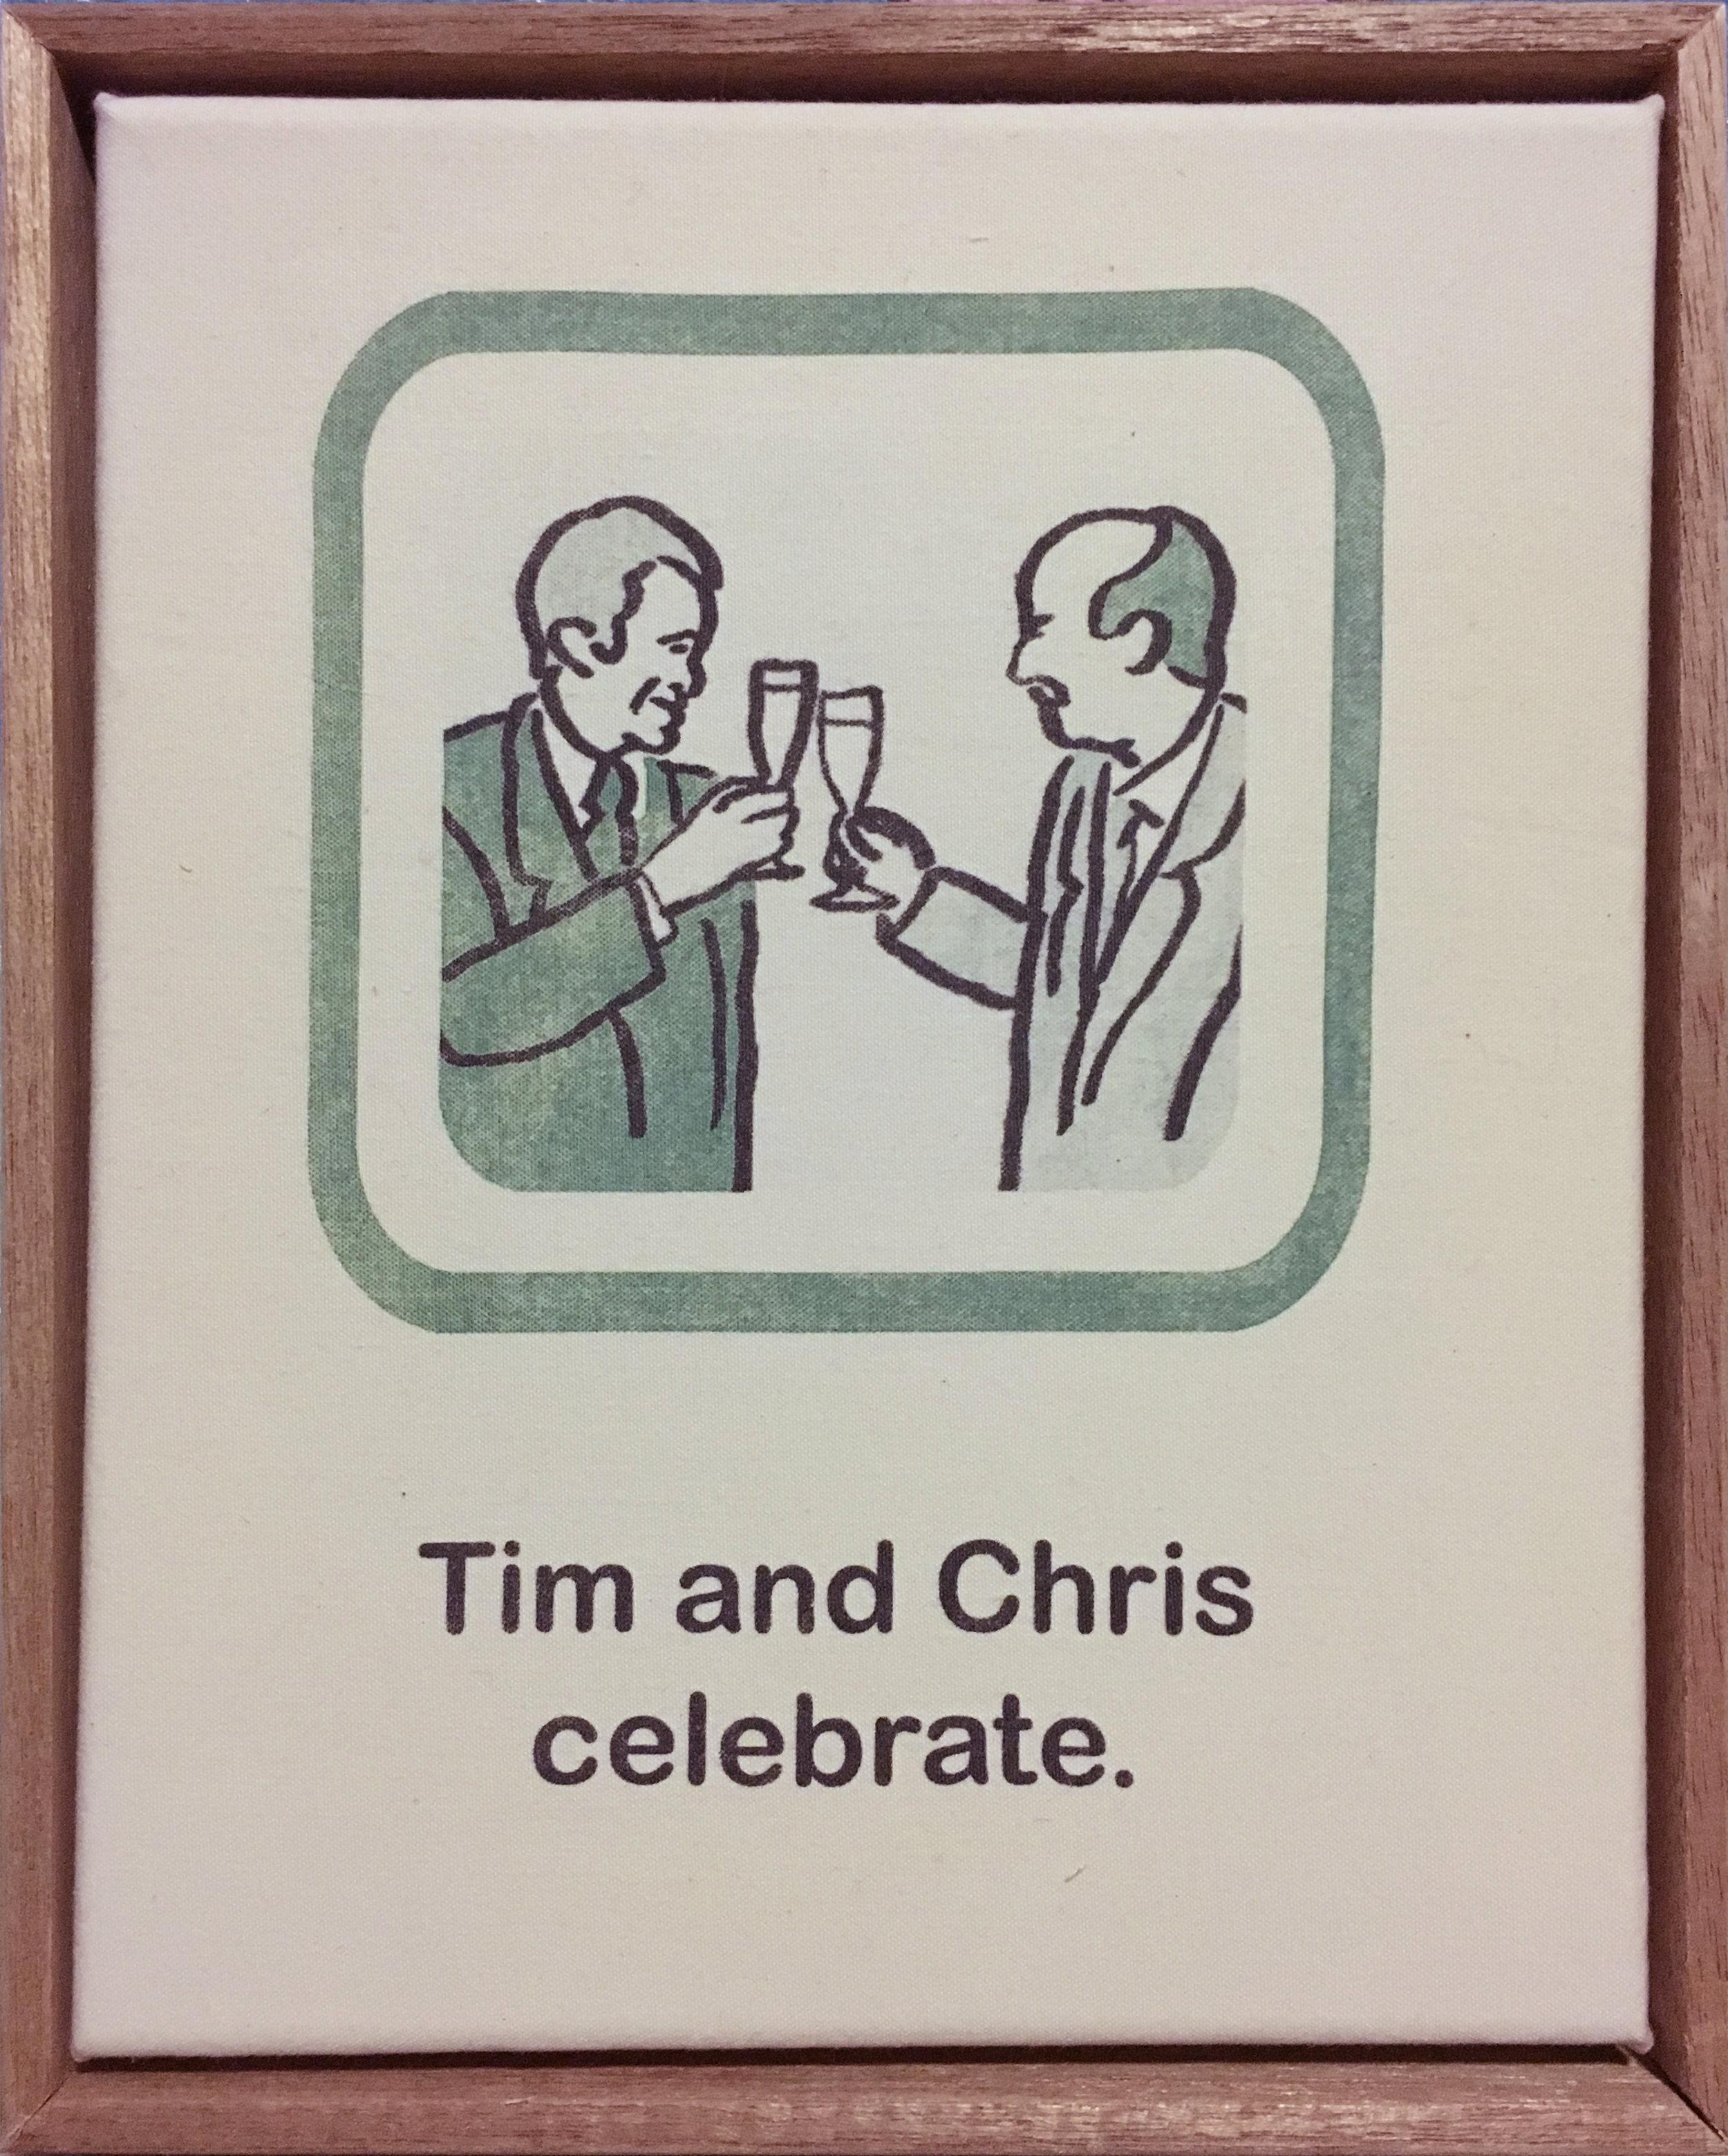 Tim and Chris celebrate.